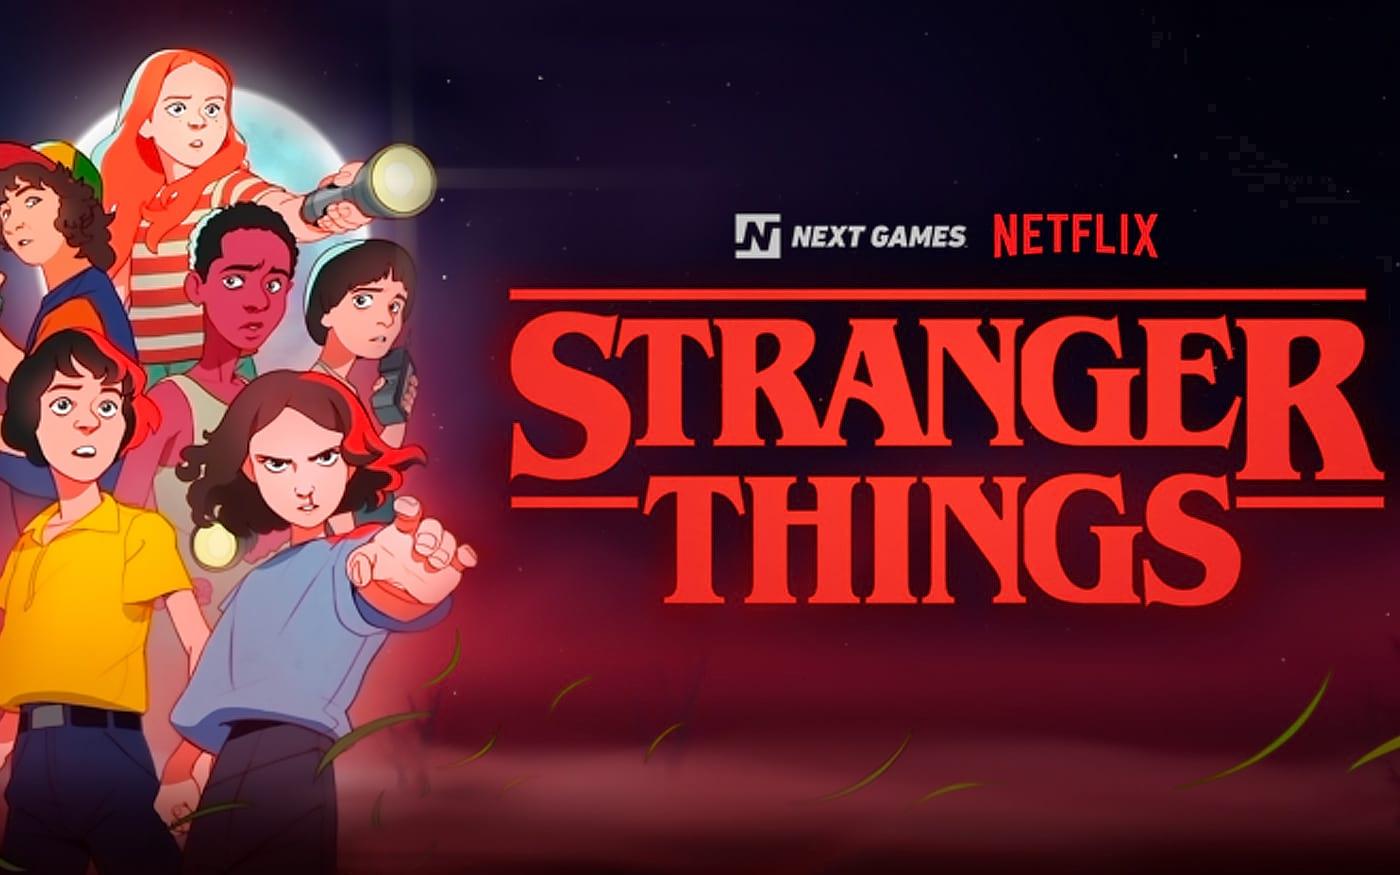 Netflix lançará jogo sobre Stranger Things em 2020